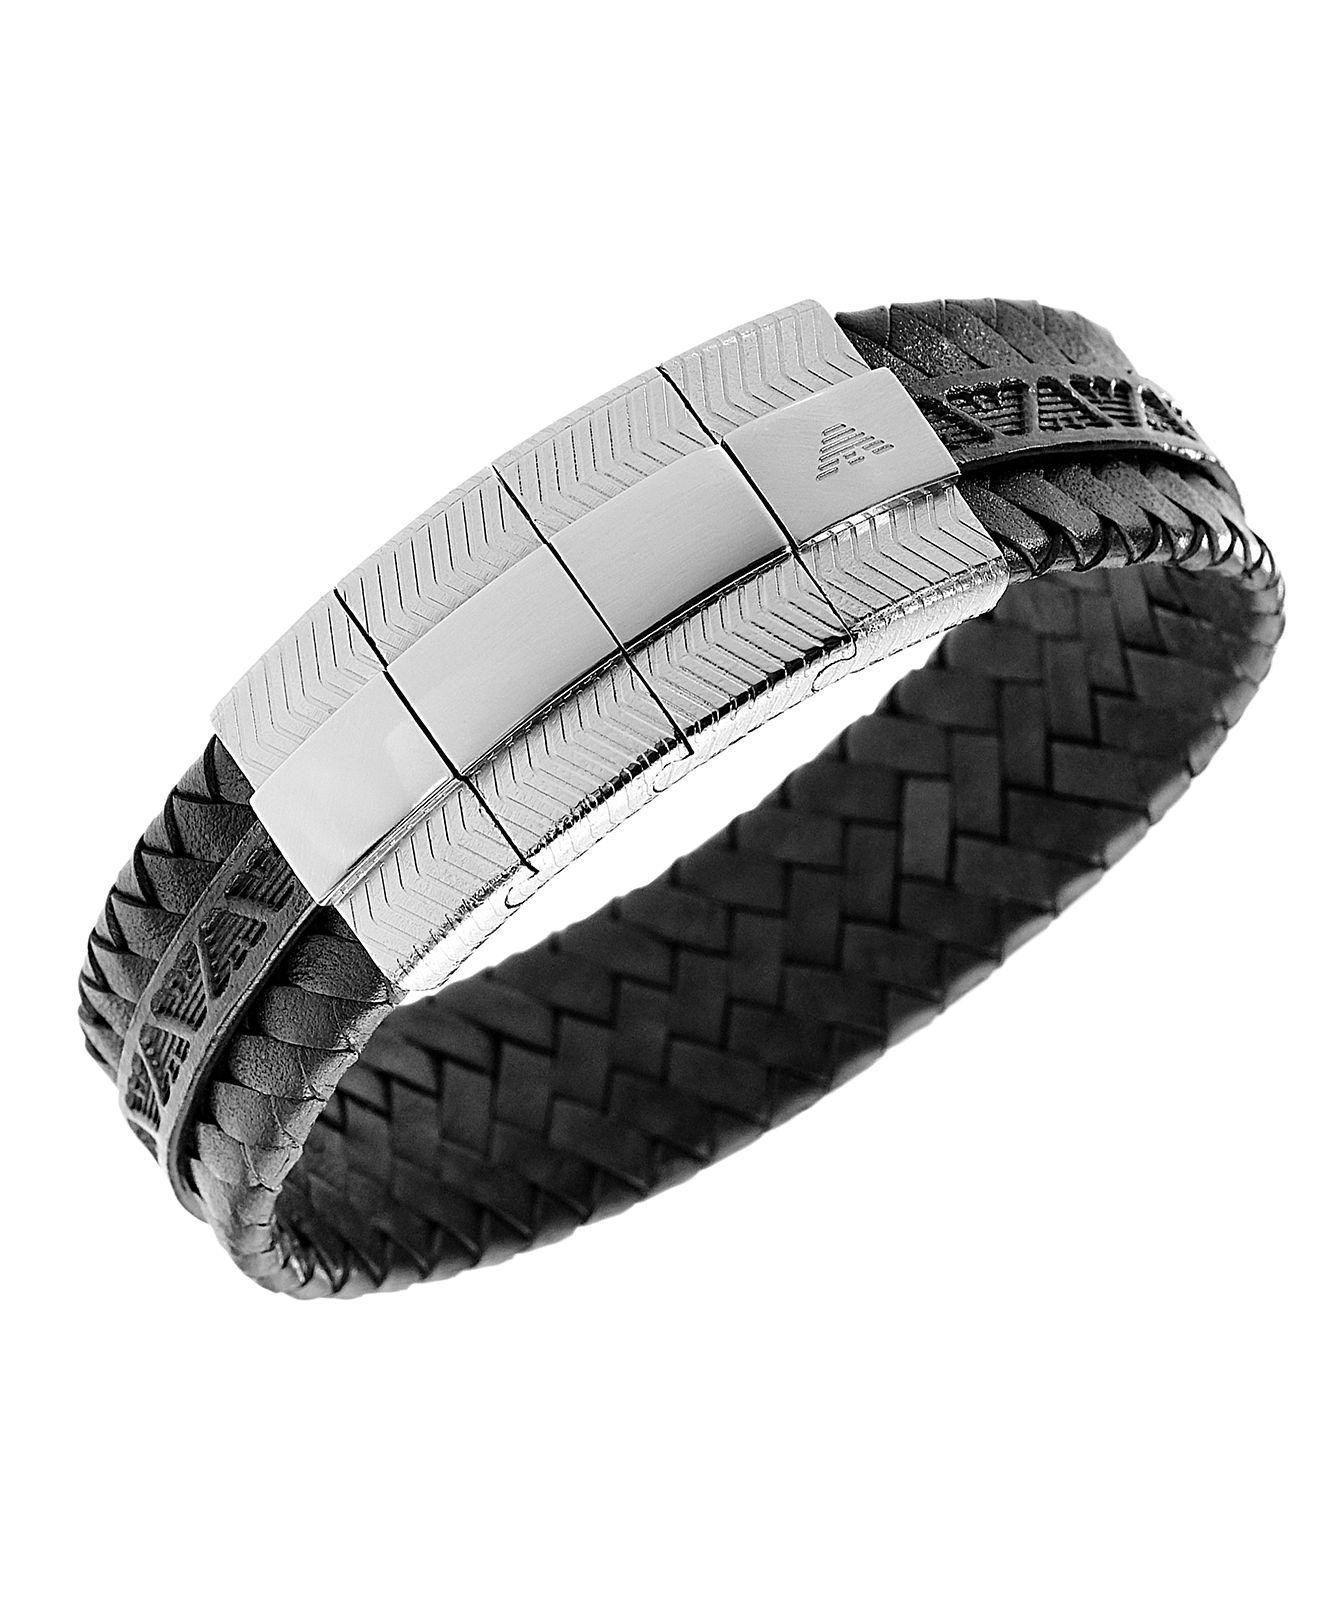 Emporio Armani Men's Bracelet, Stainless Steel And Black Leather Bracelet  Egs1534  Fashion Jewelry